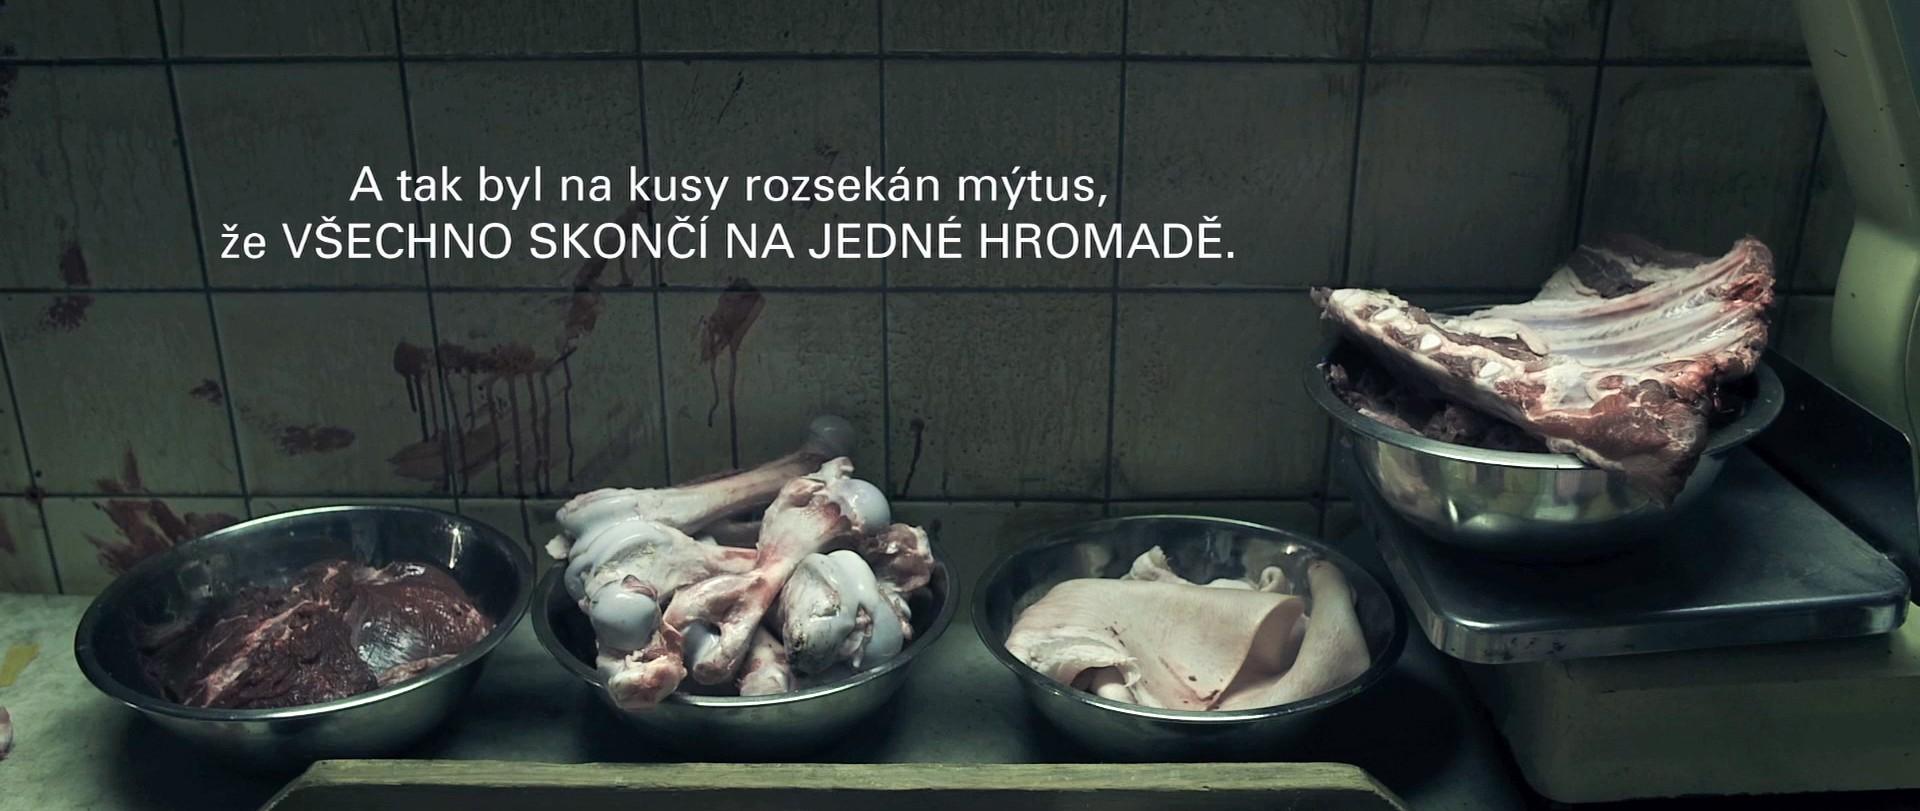 samosebou_film_tridilove_mytus_trideni_odpadu